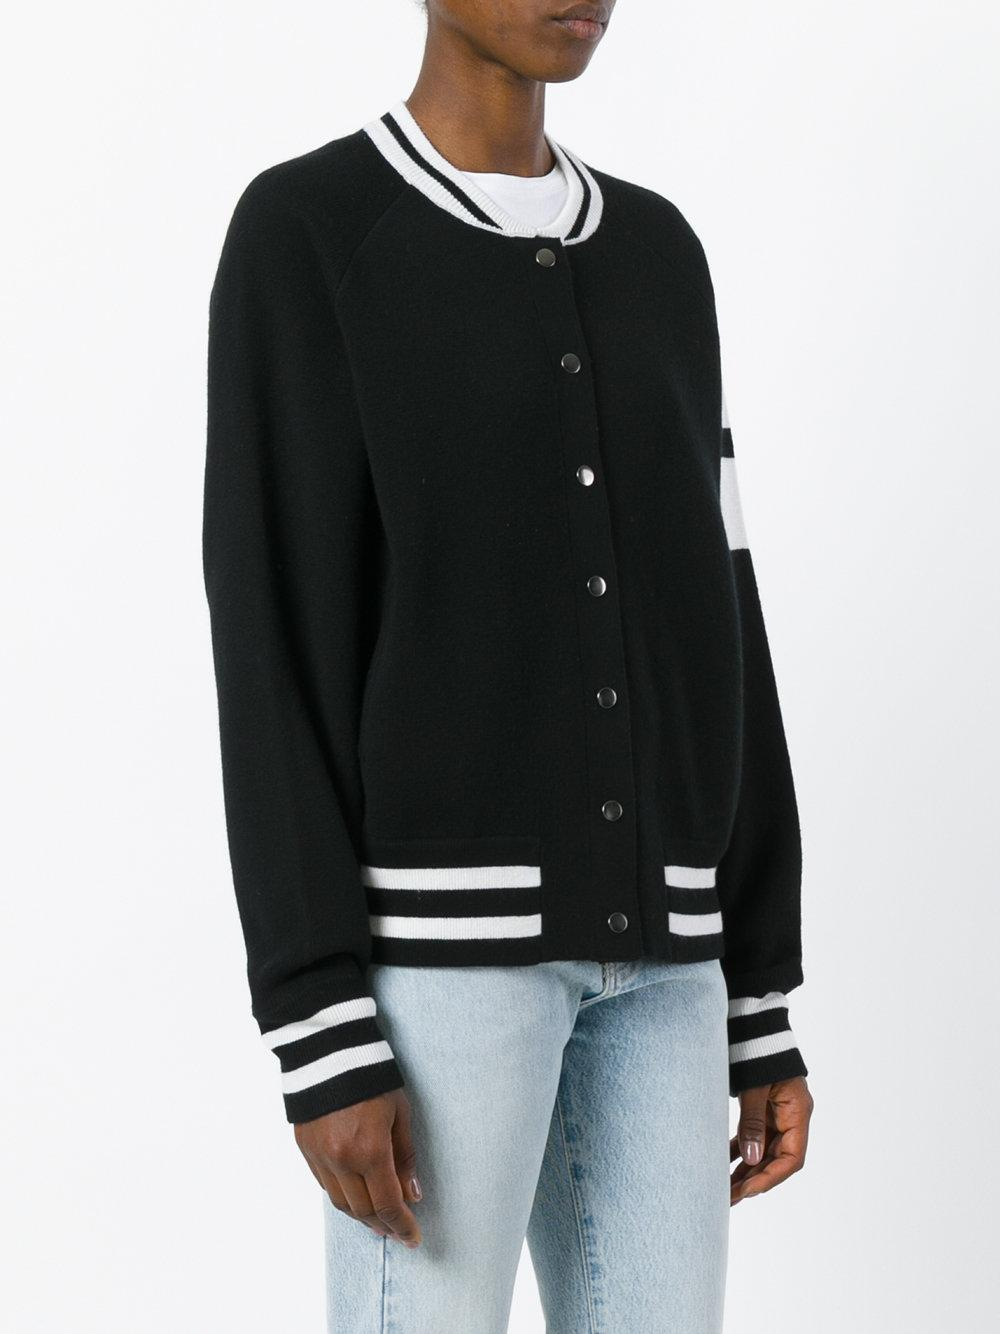 Zoe Jordan Edison Bomber Jacket In Black Lyst